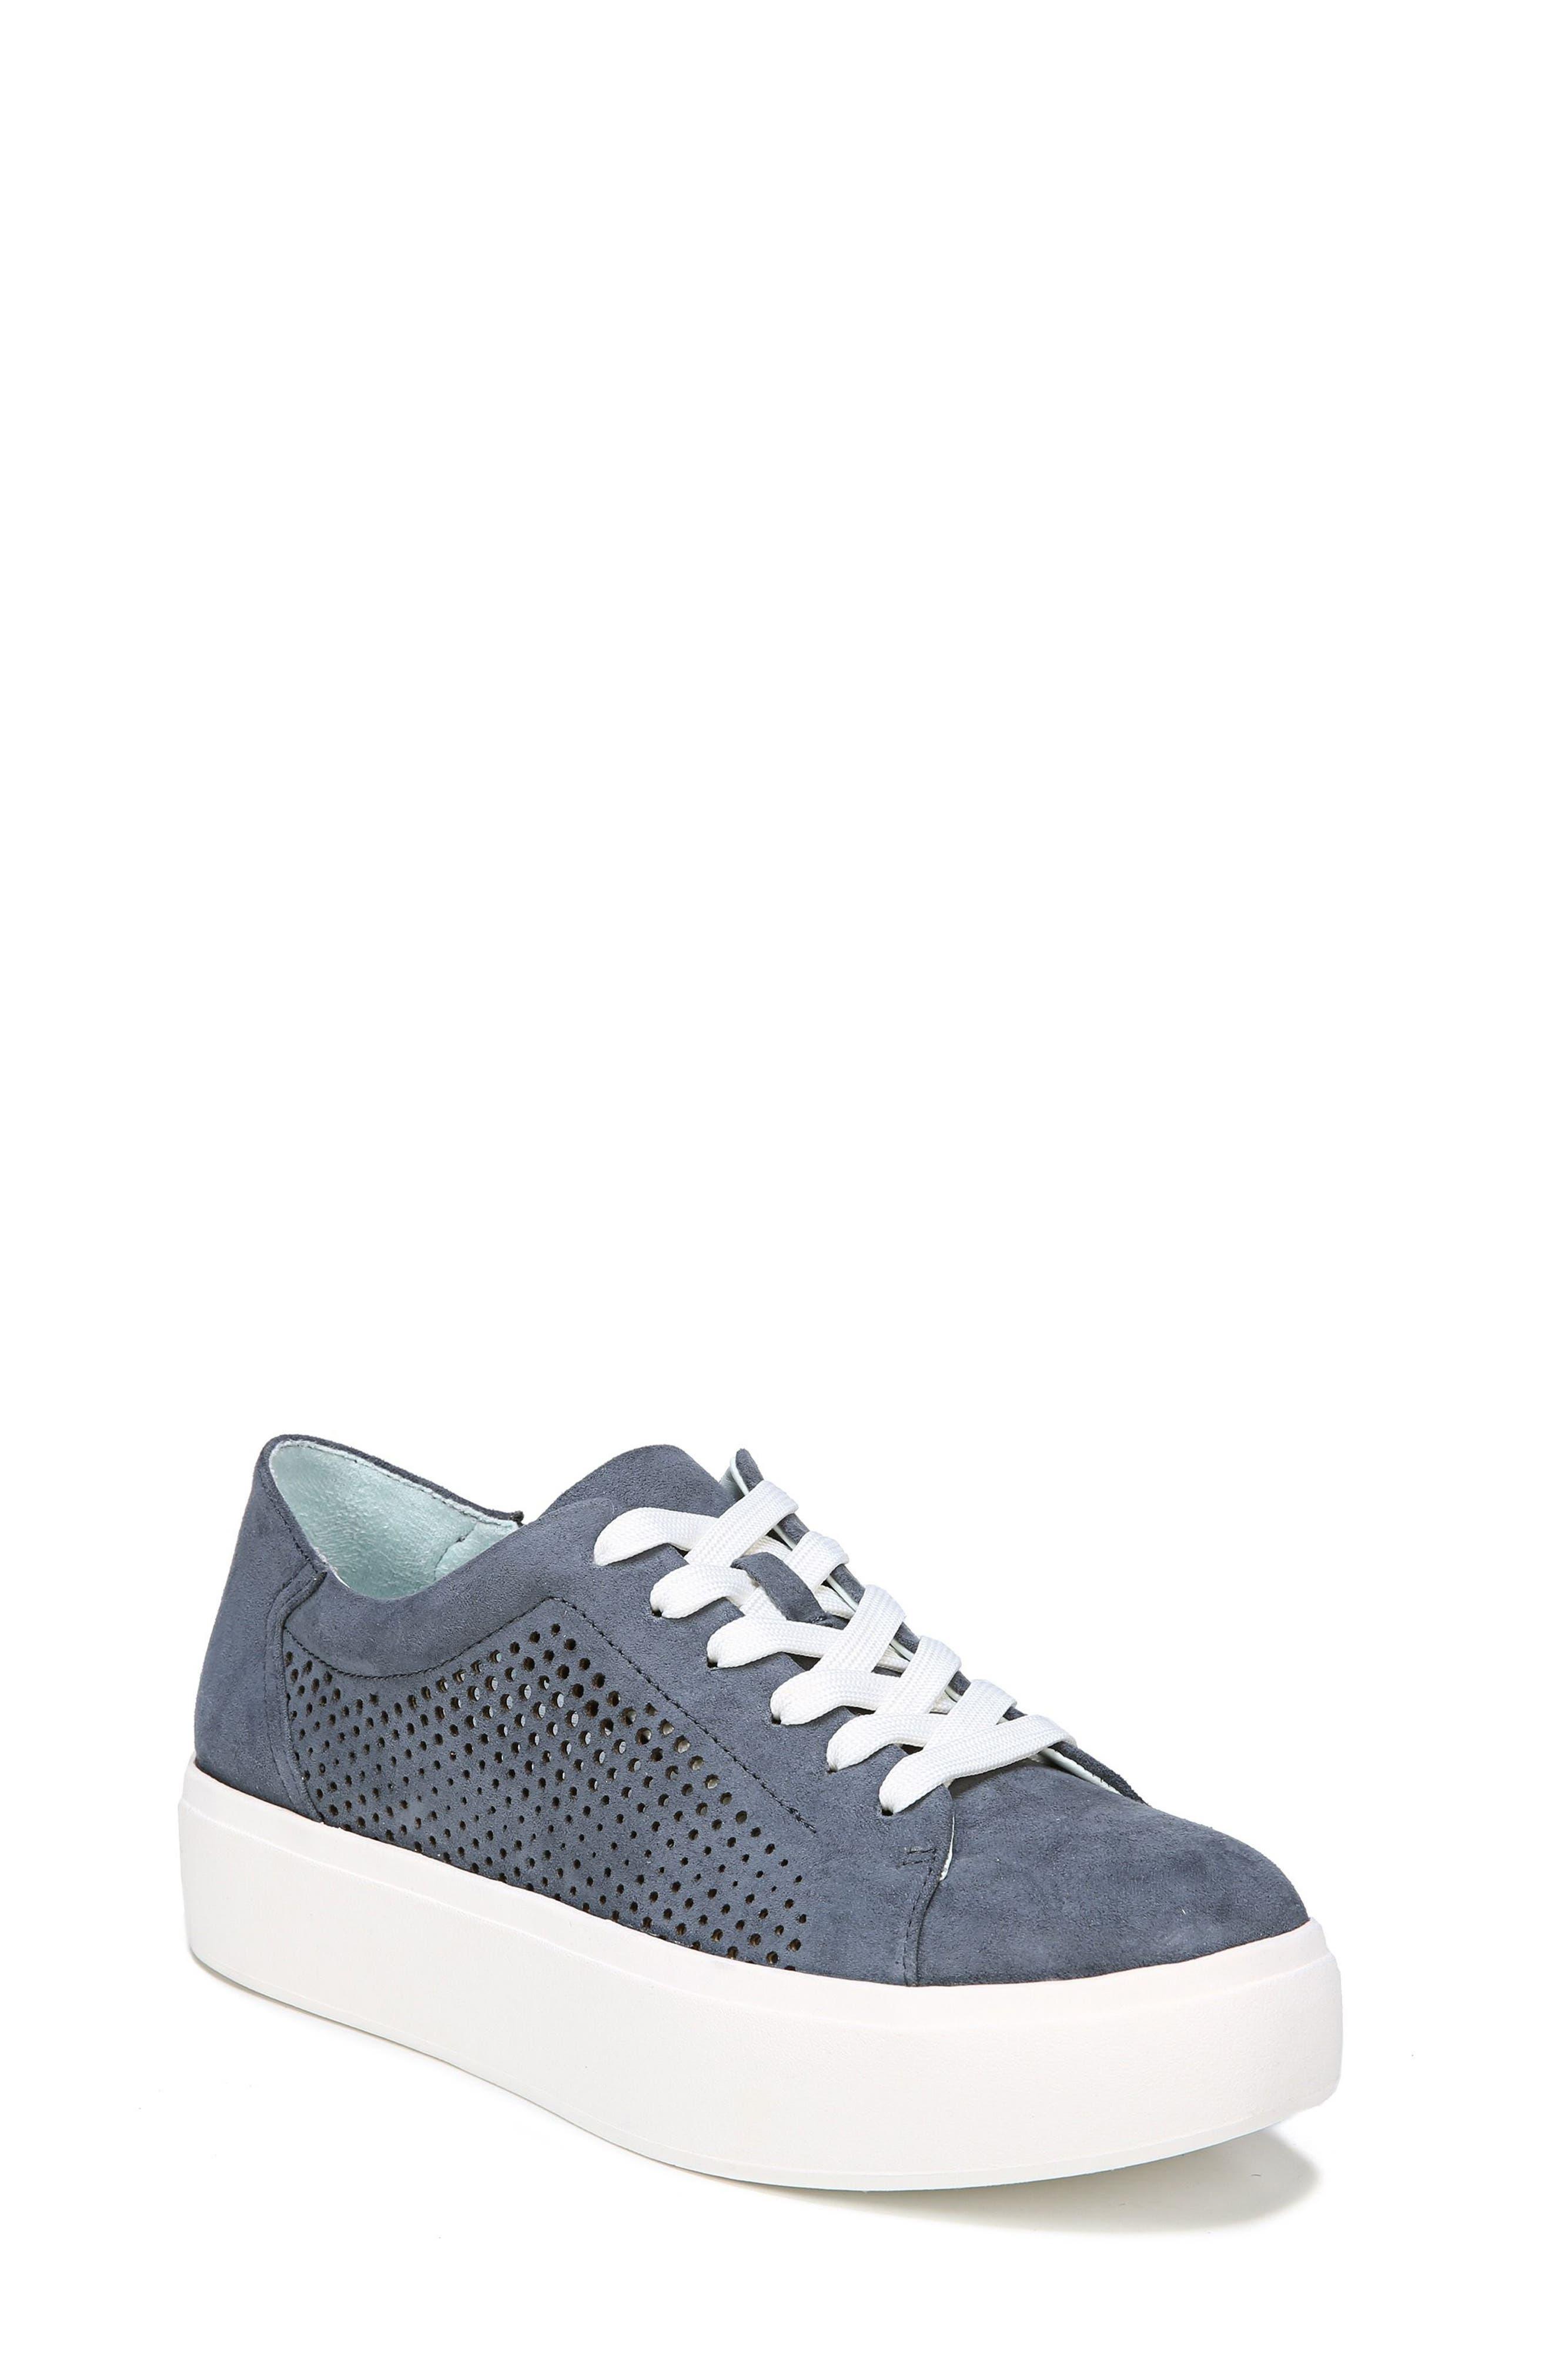 Main Image - Dr. Scholl's Kinney Platform Sneaker (Women)